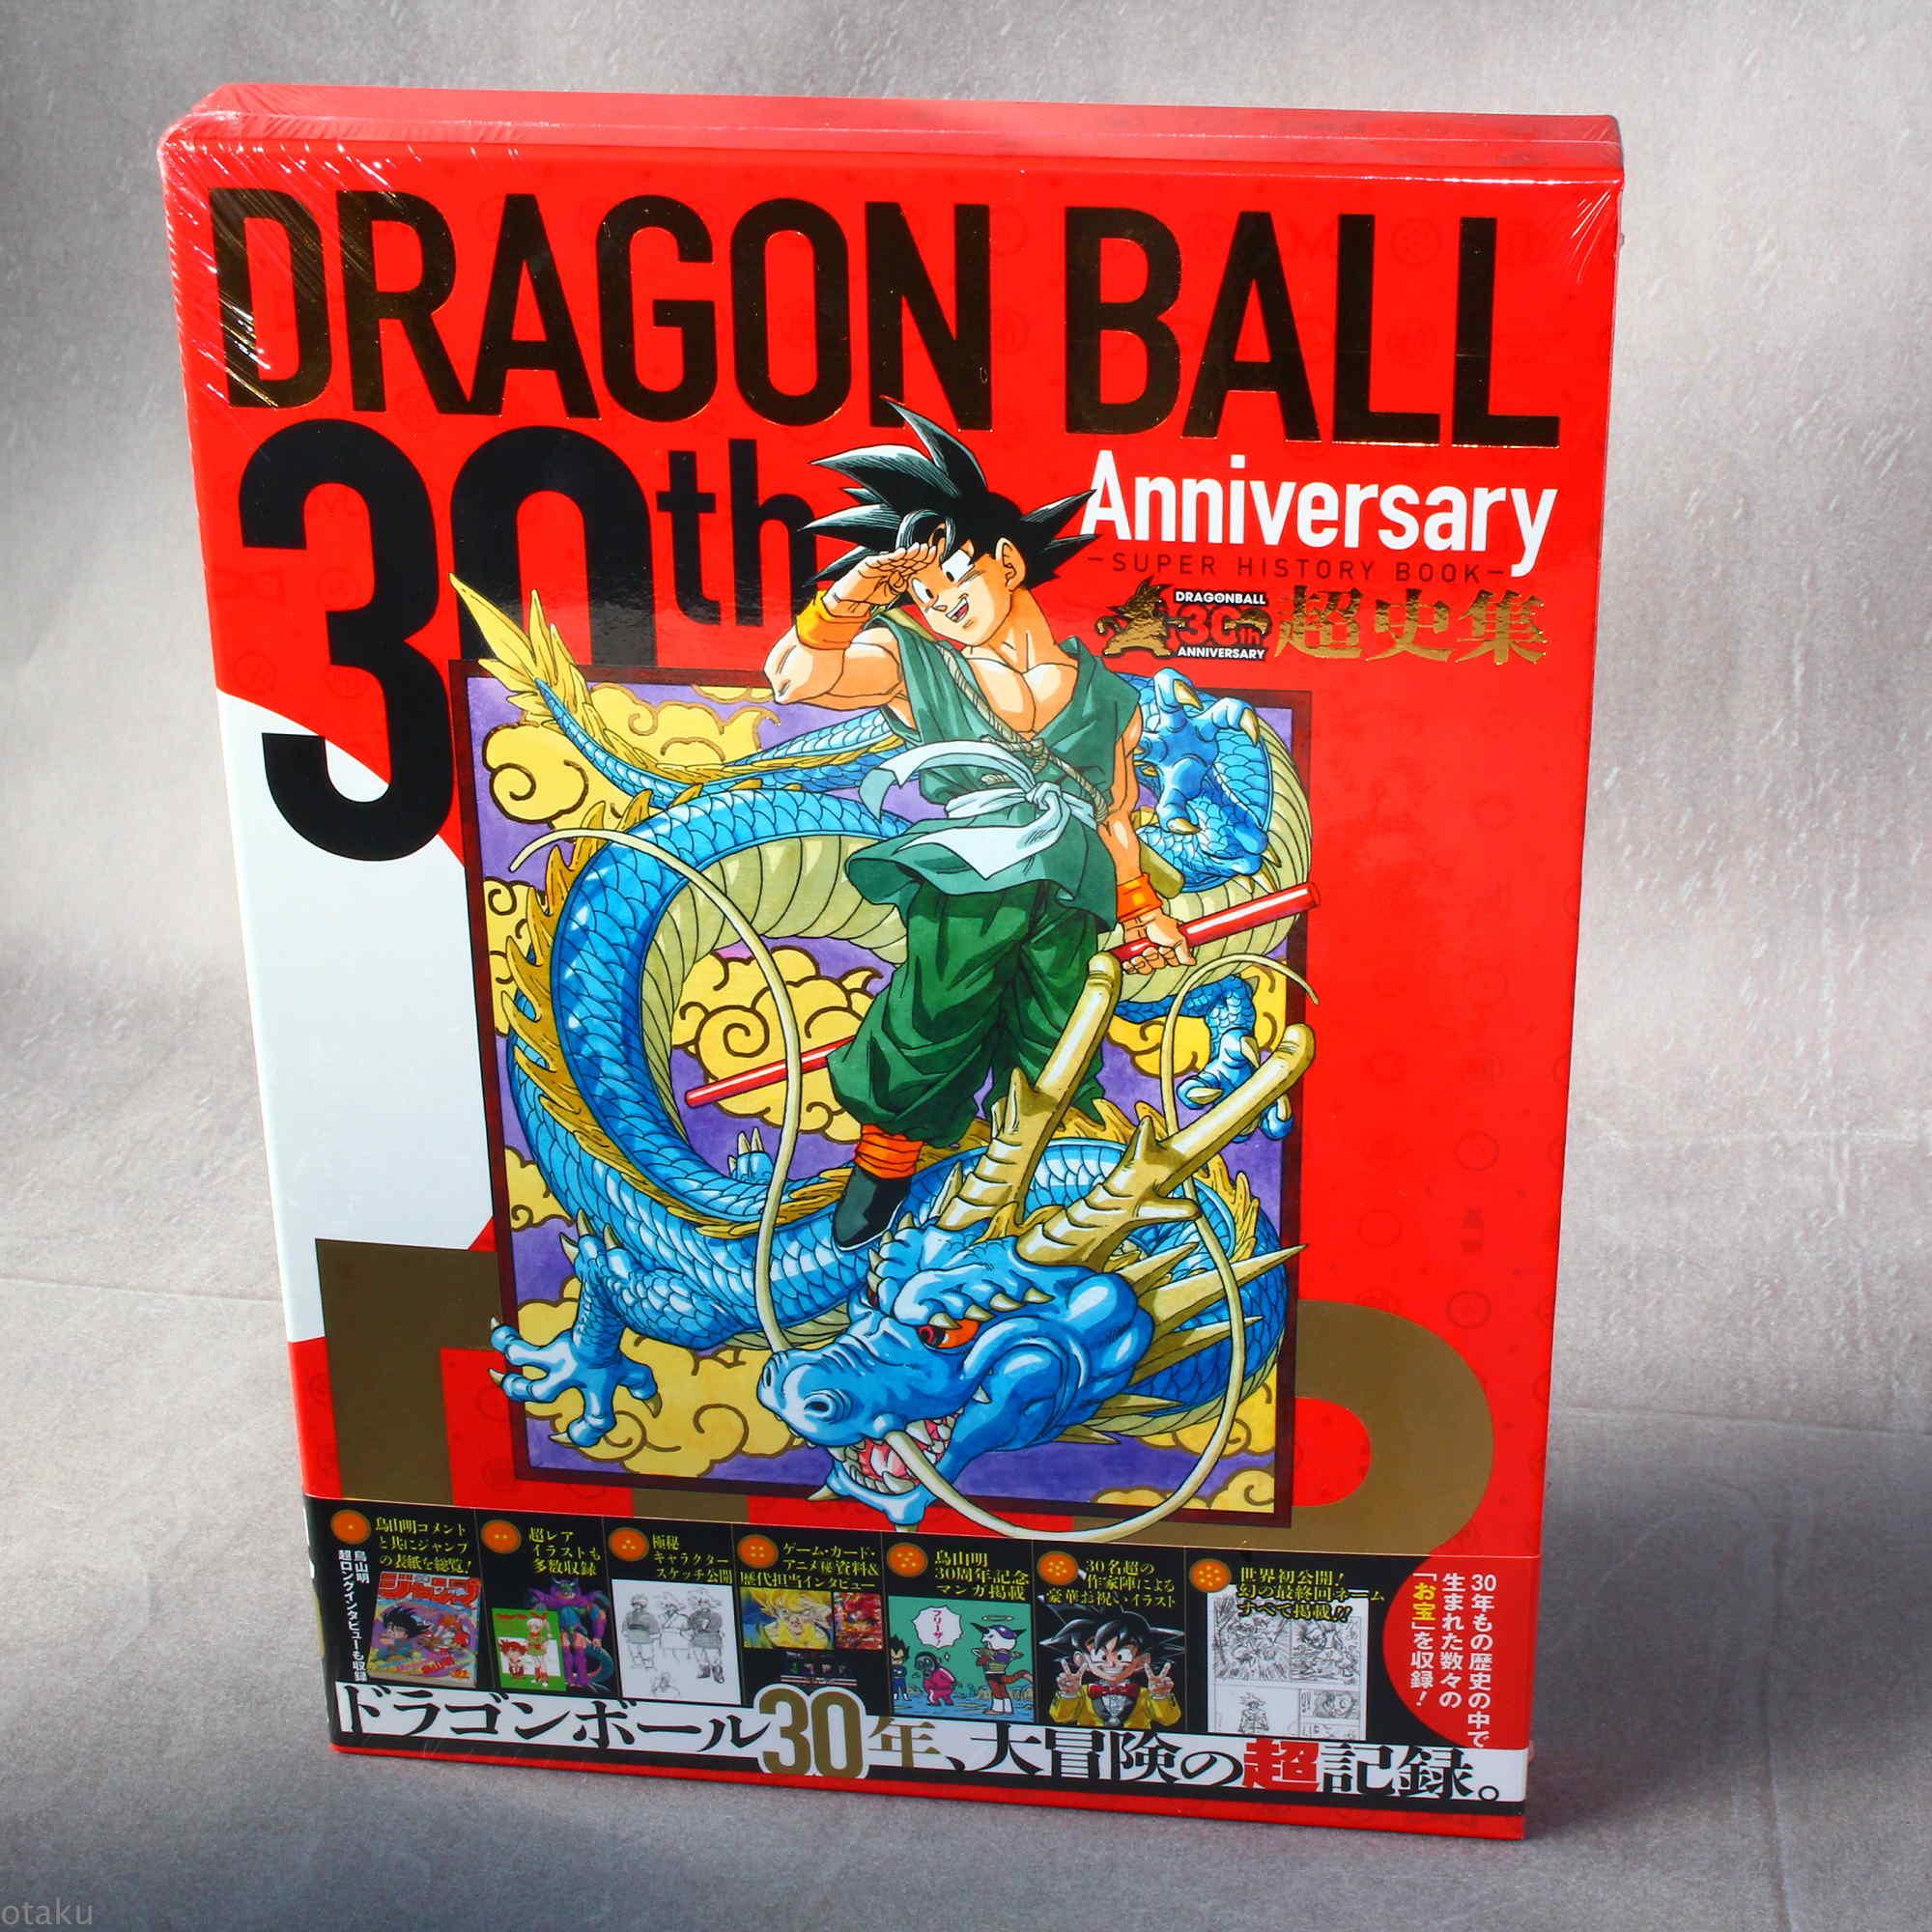 Dragon Ball 30th Anniversary book